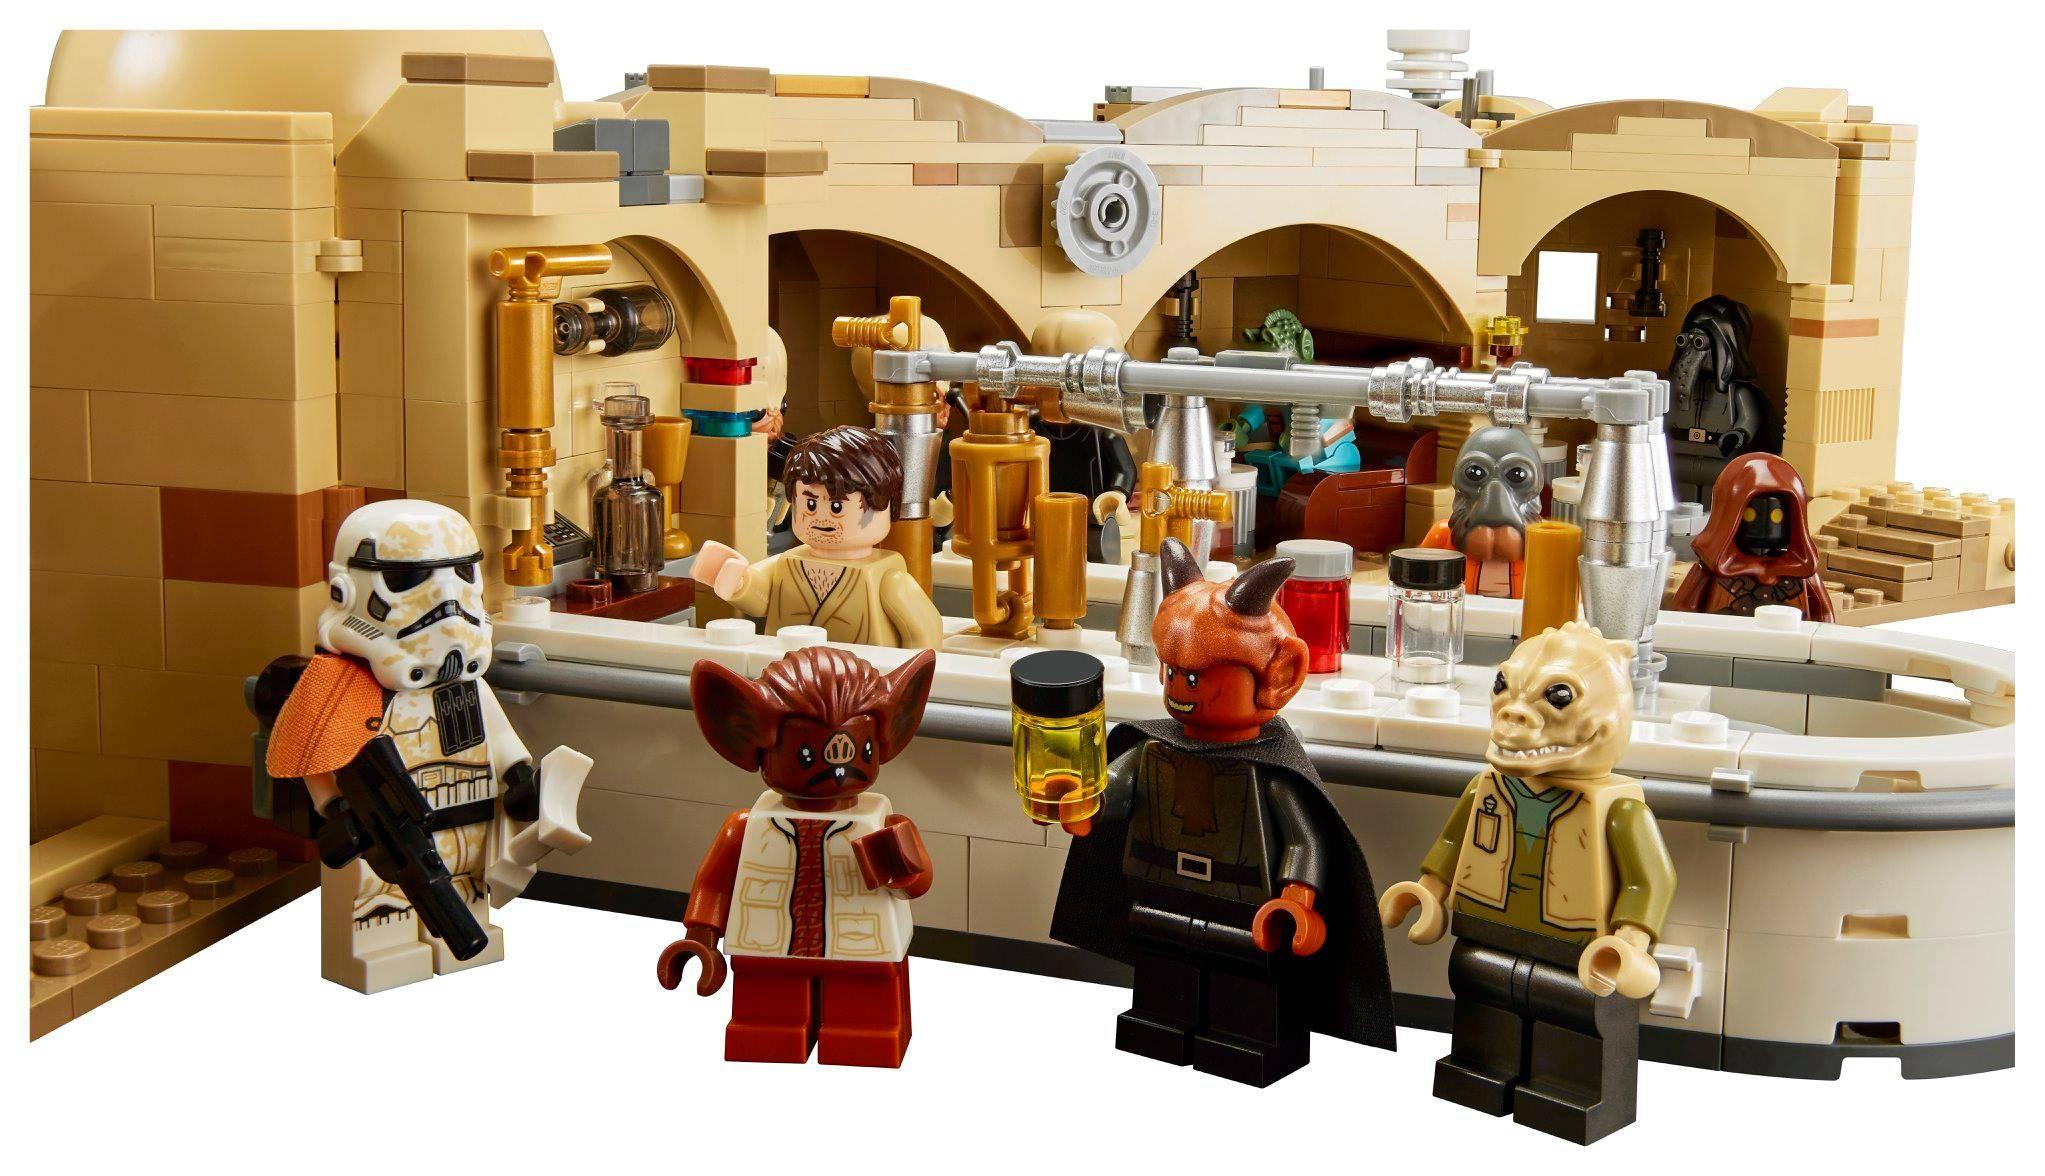 Lego Star Wars Cantina Mos Eisley